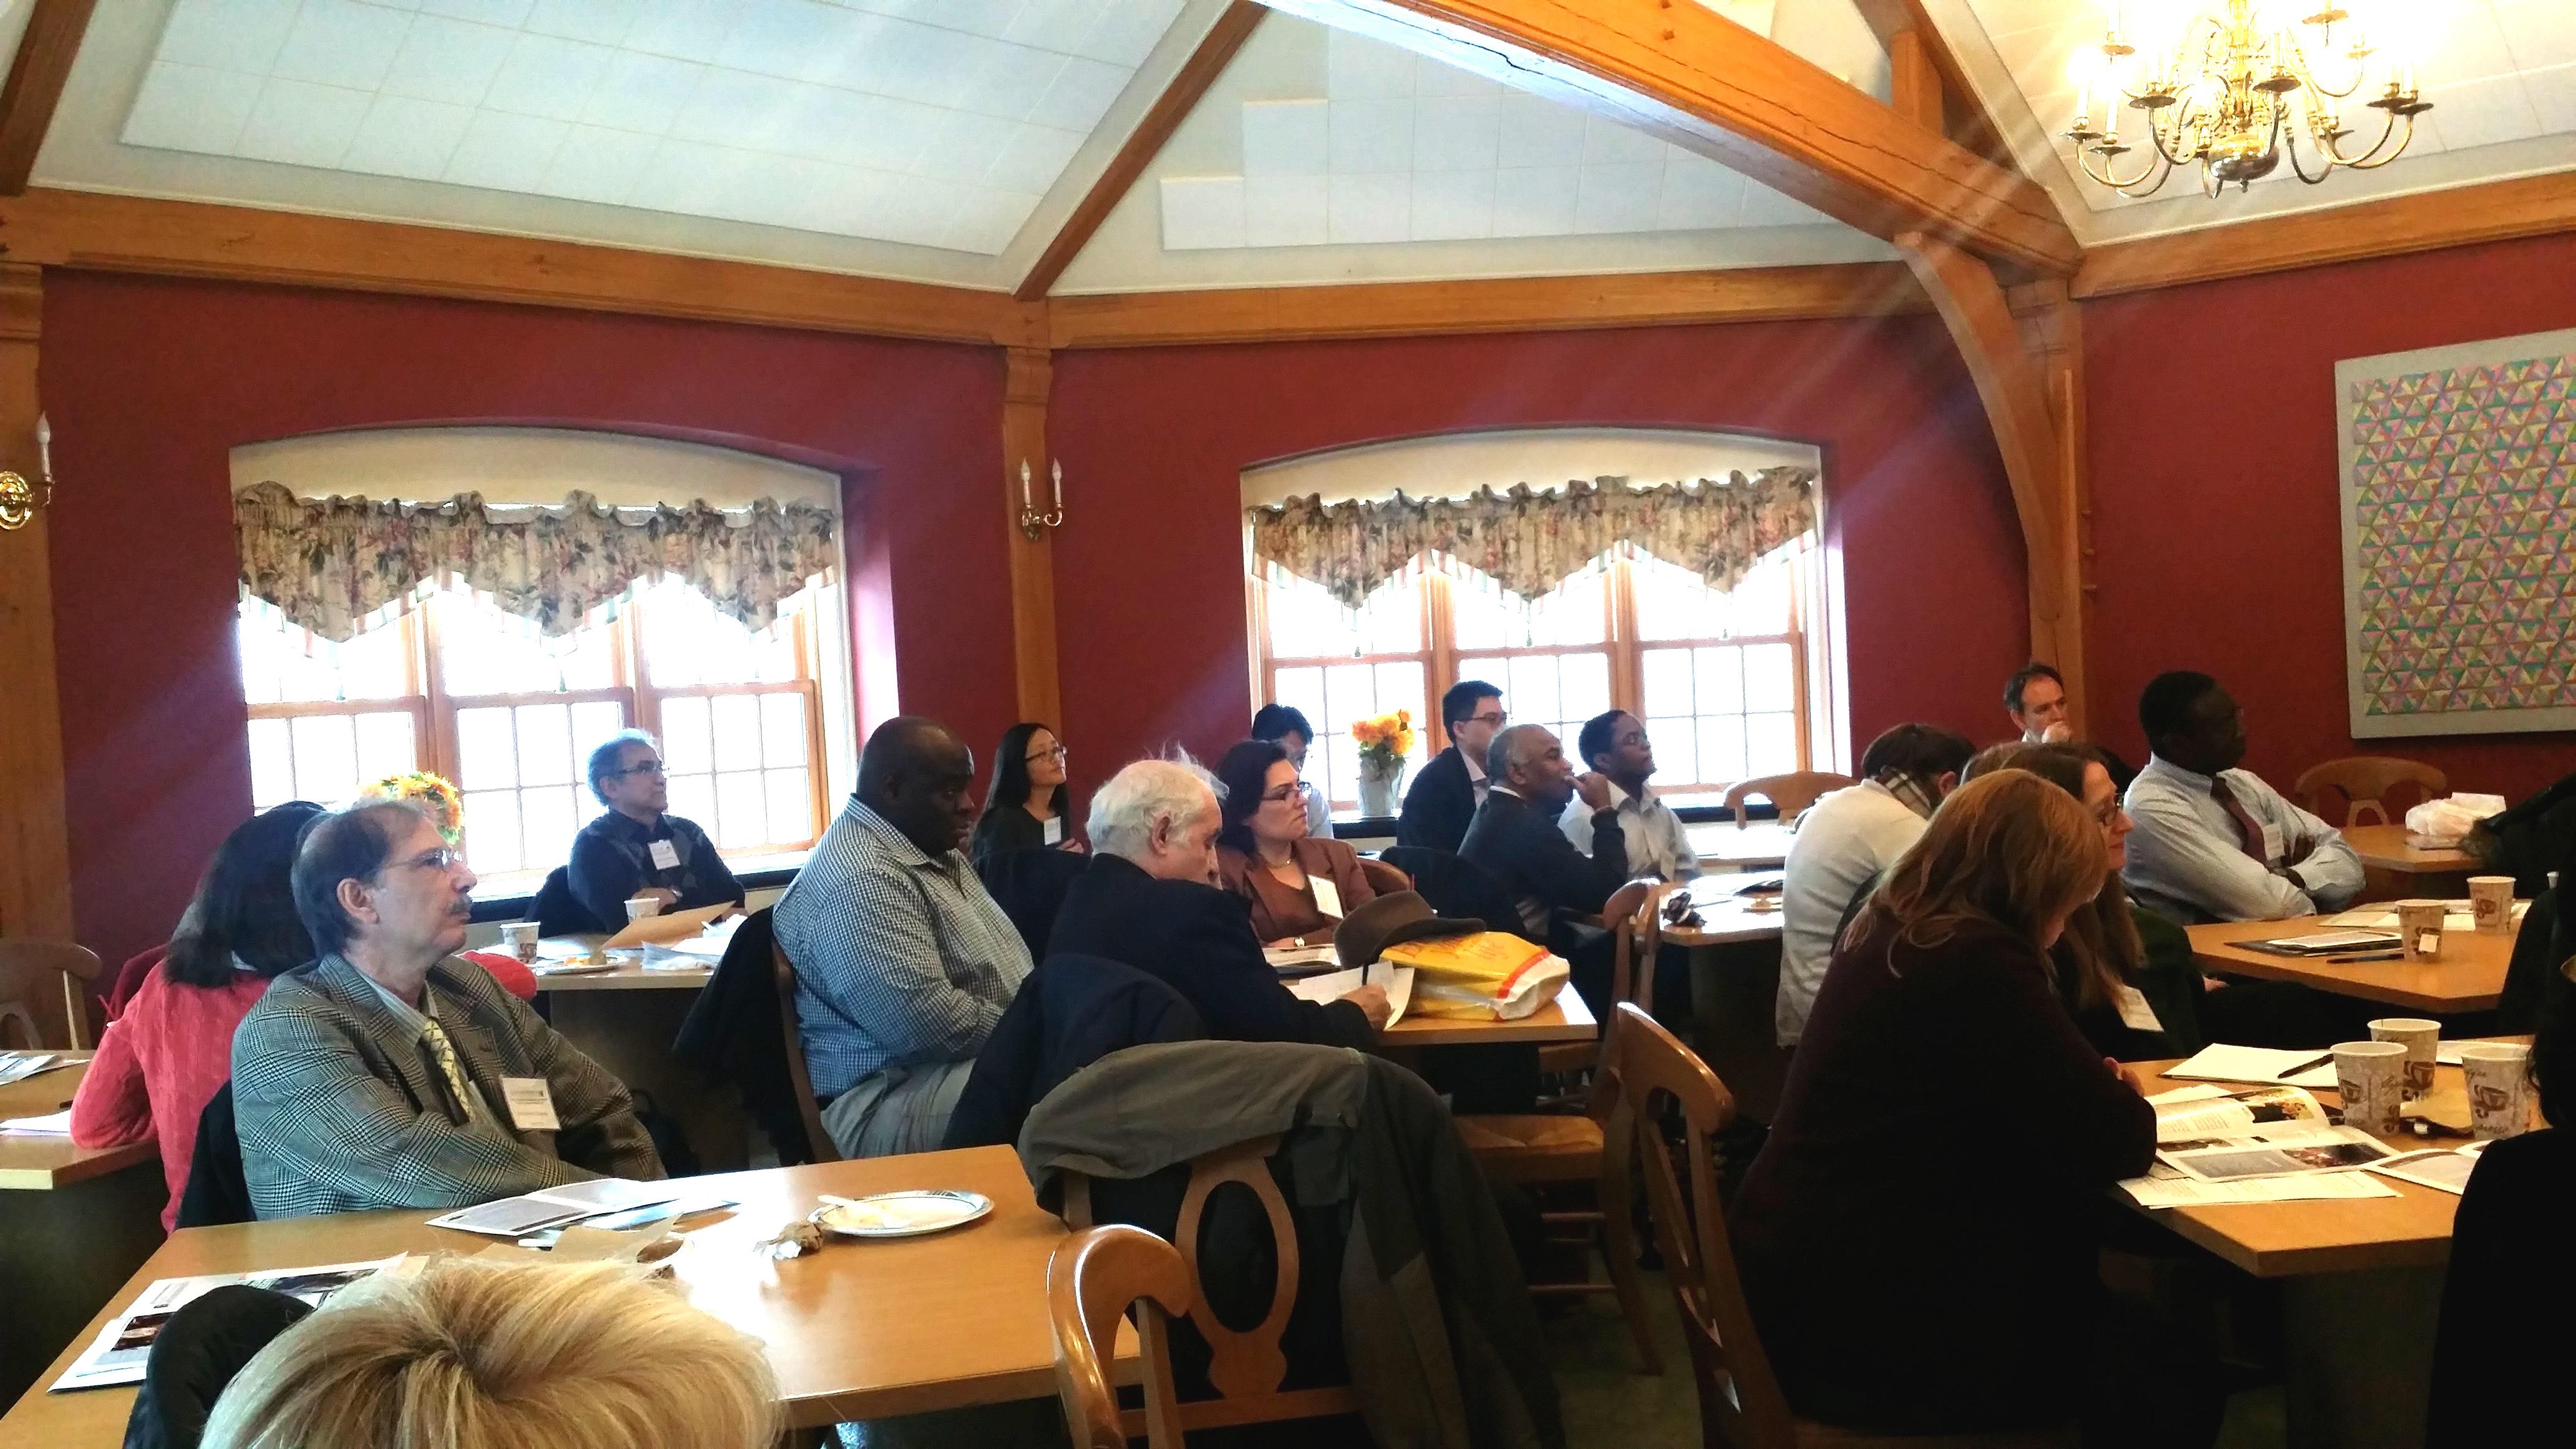 Faculty Development Retreat On January 25